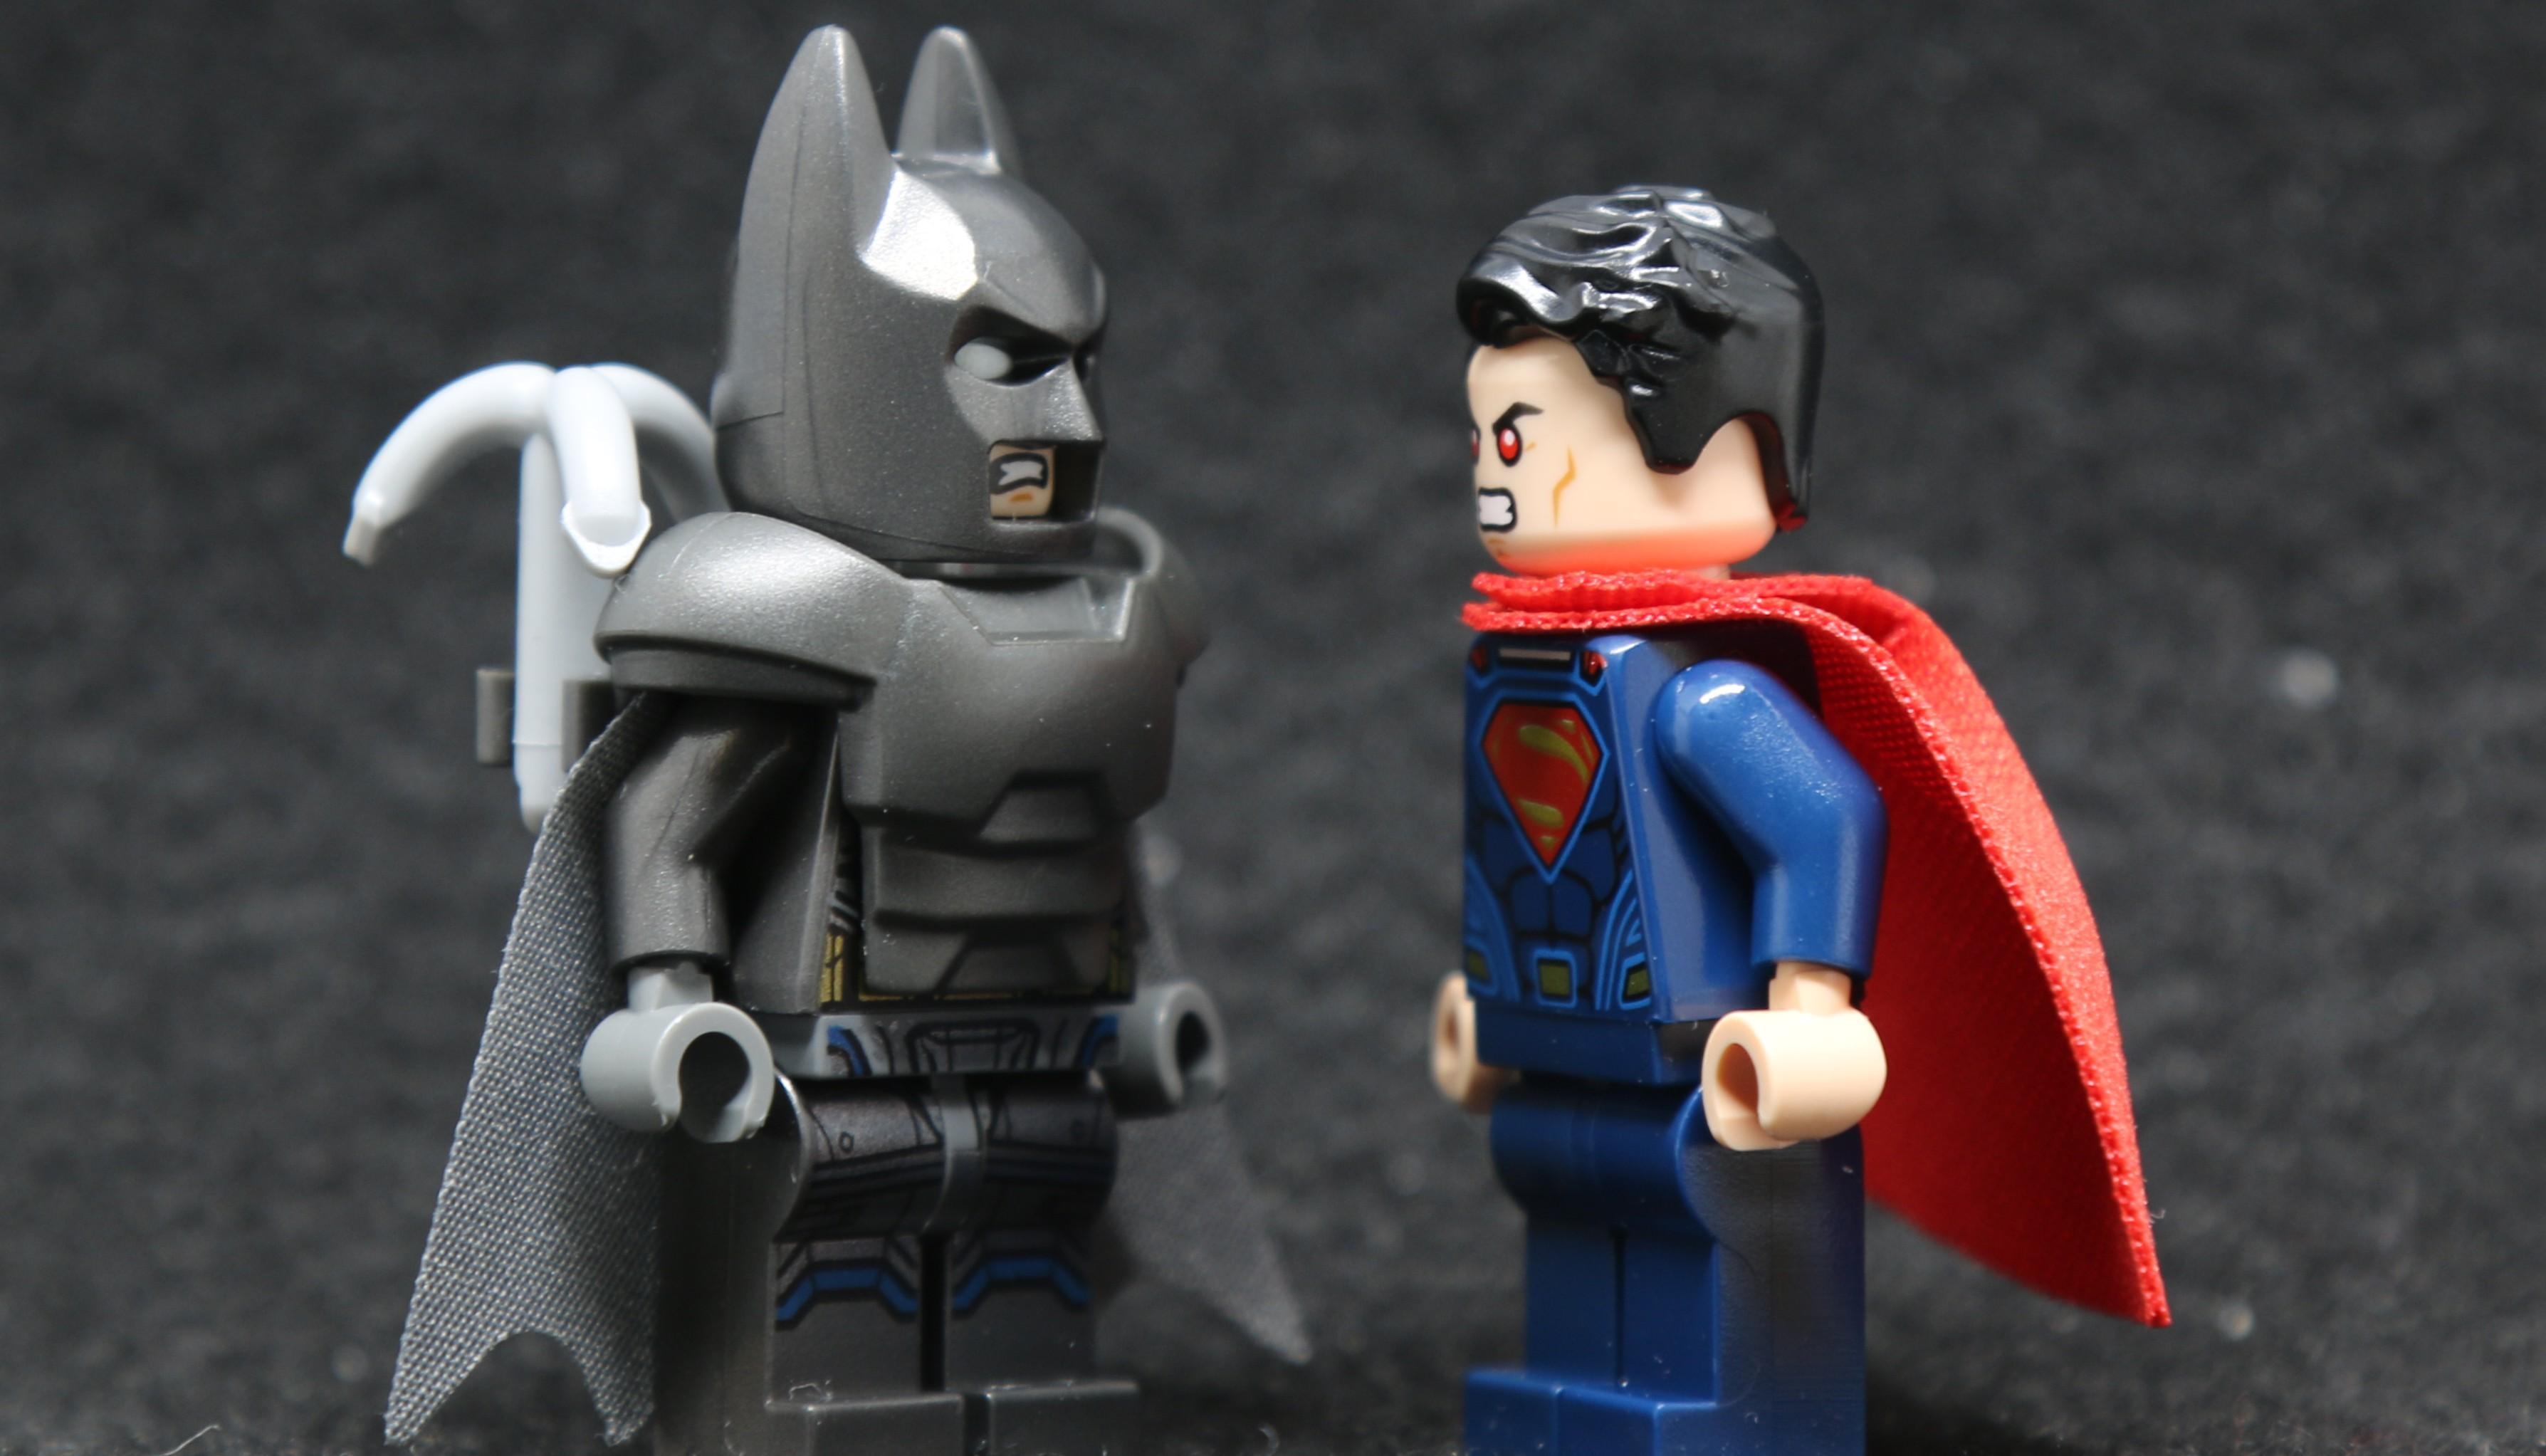 LEGO-76044-Clash-of-the-Heroes-Batman-vs-Superman-Minifigure